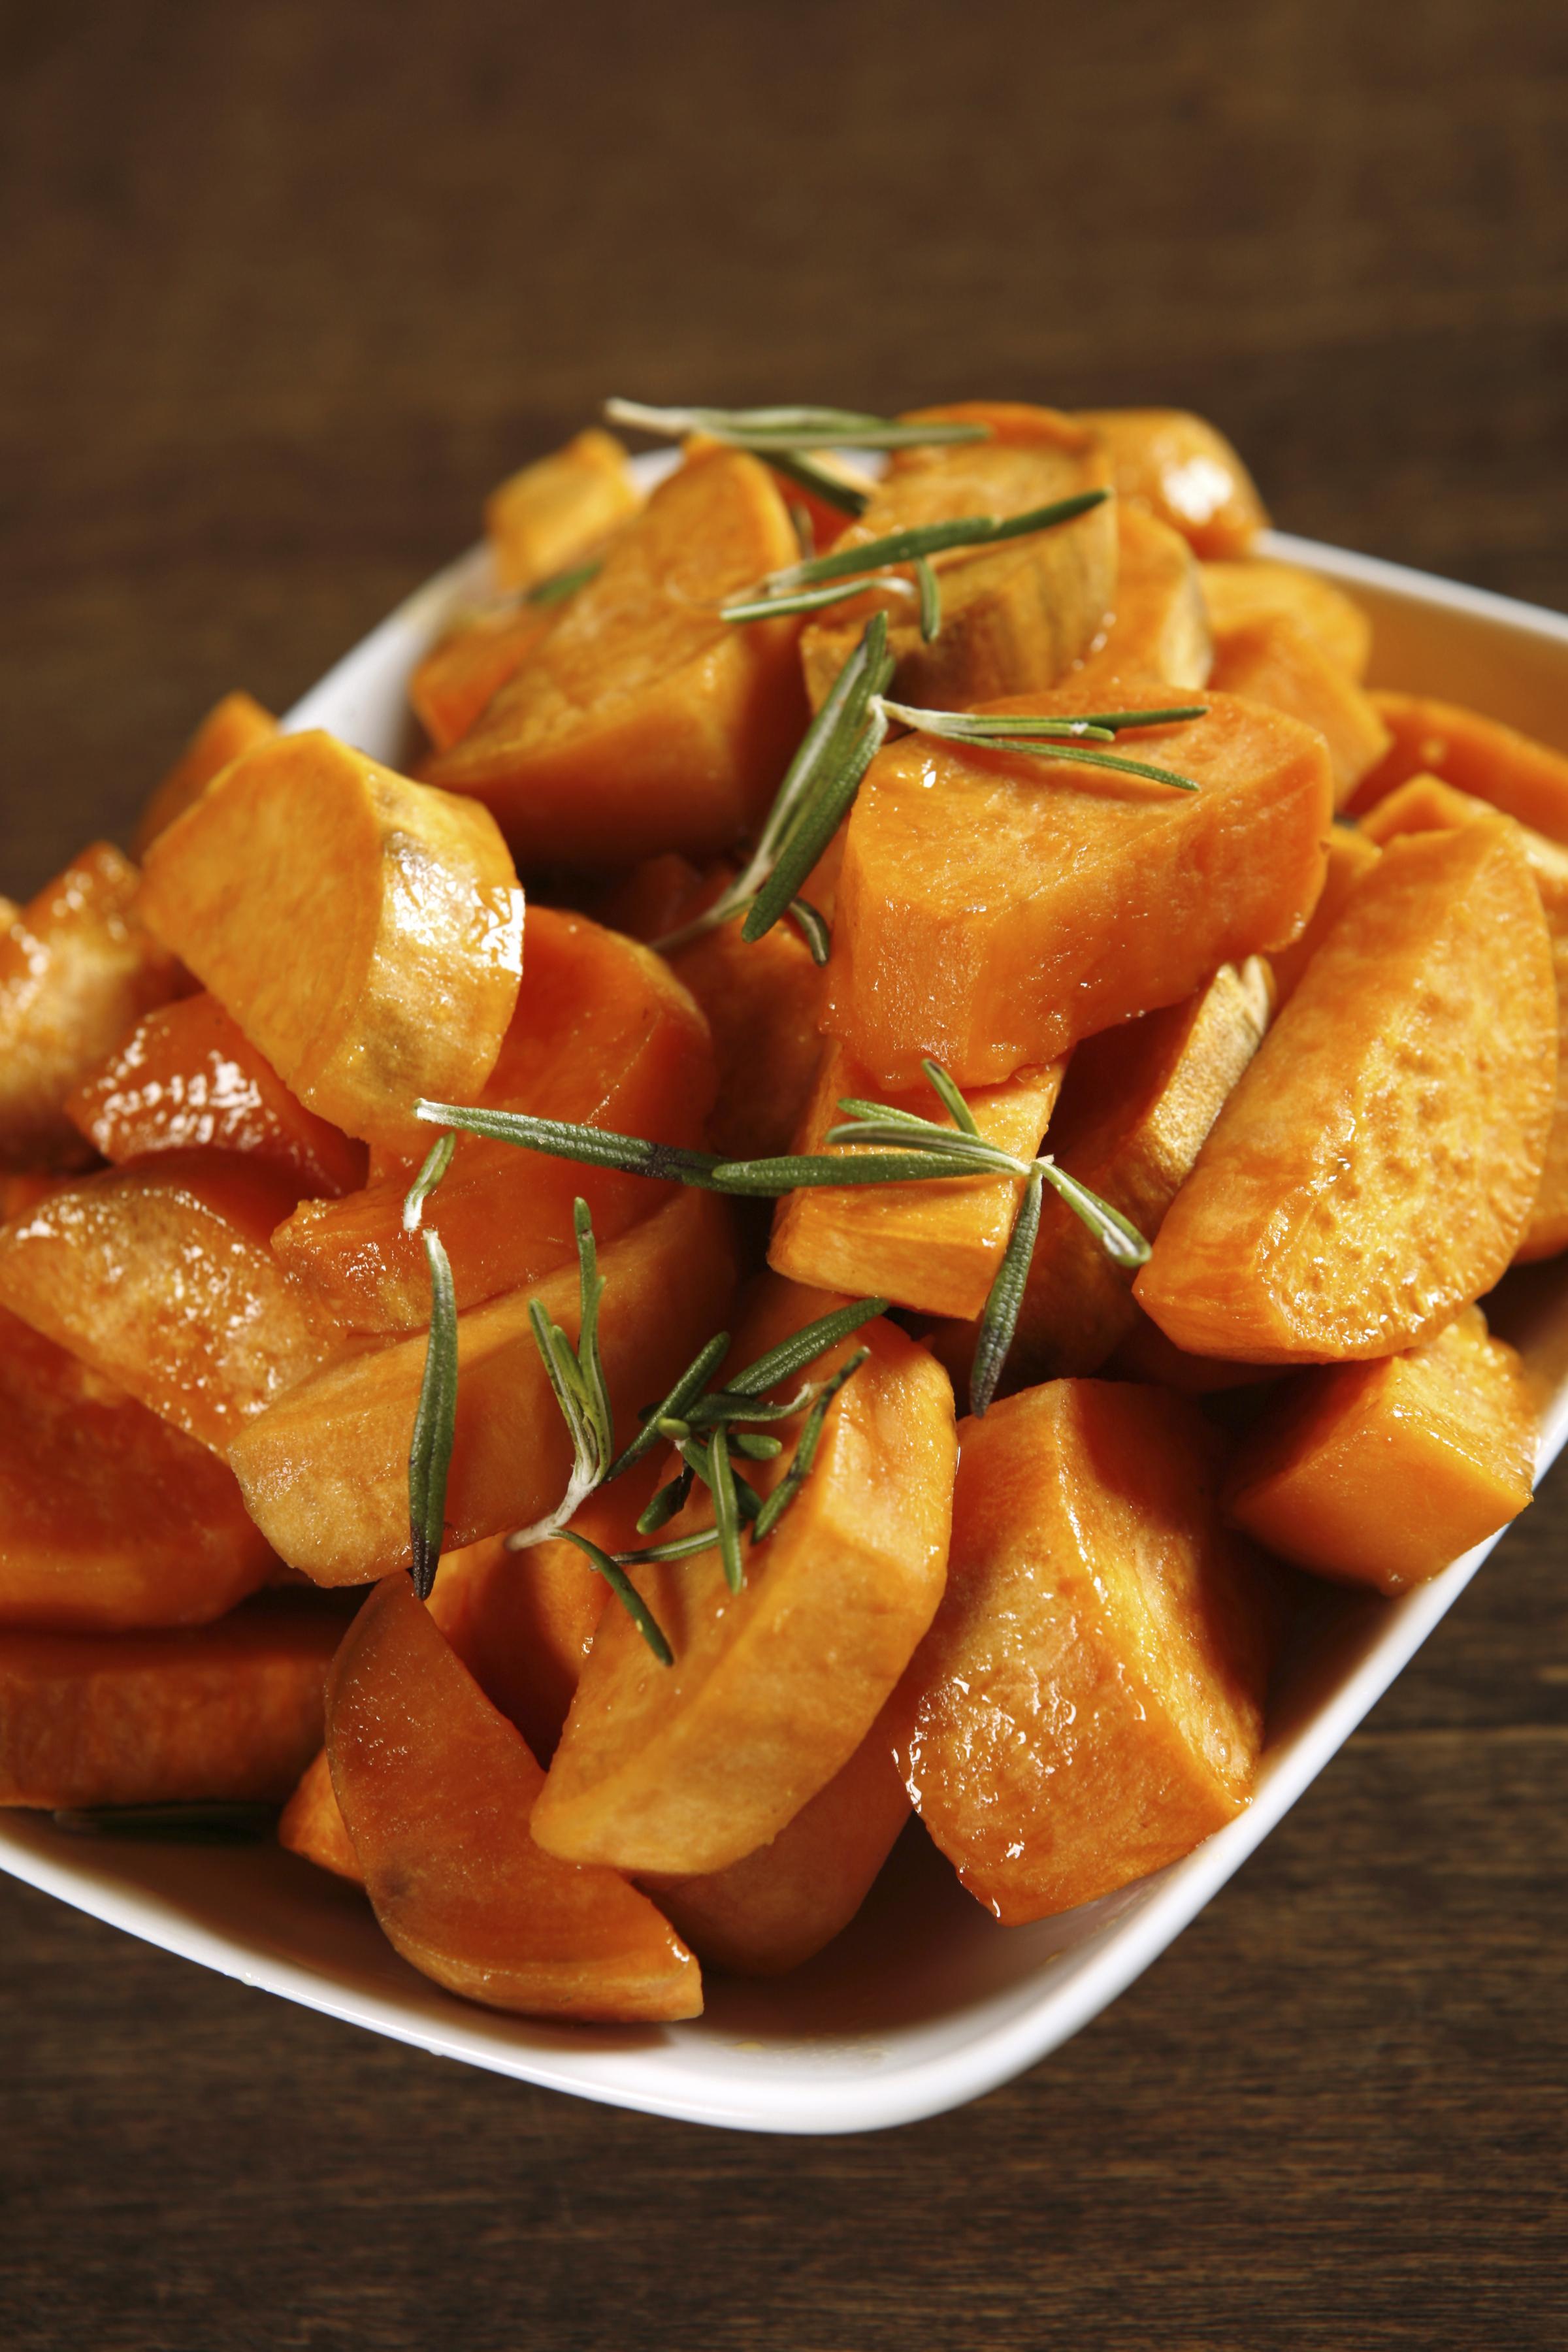 Boniatos asados en almibar de naranjas